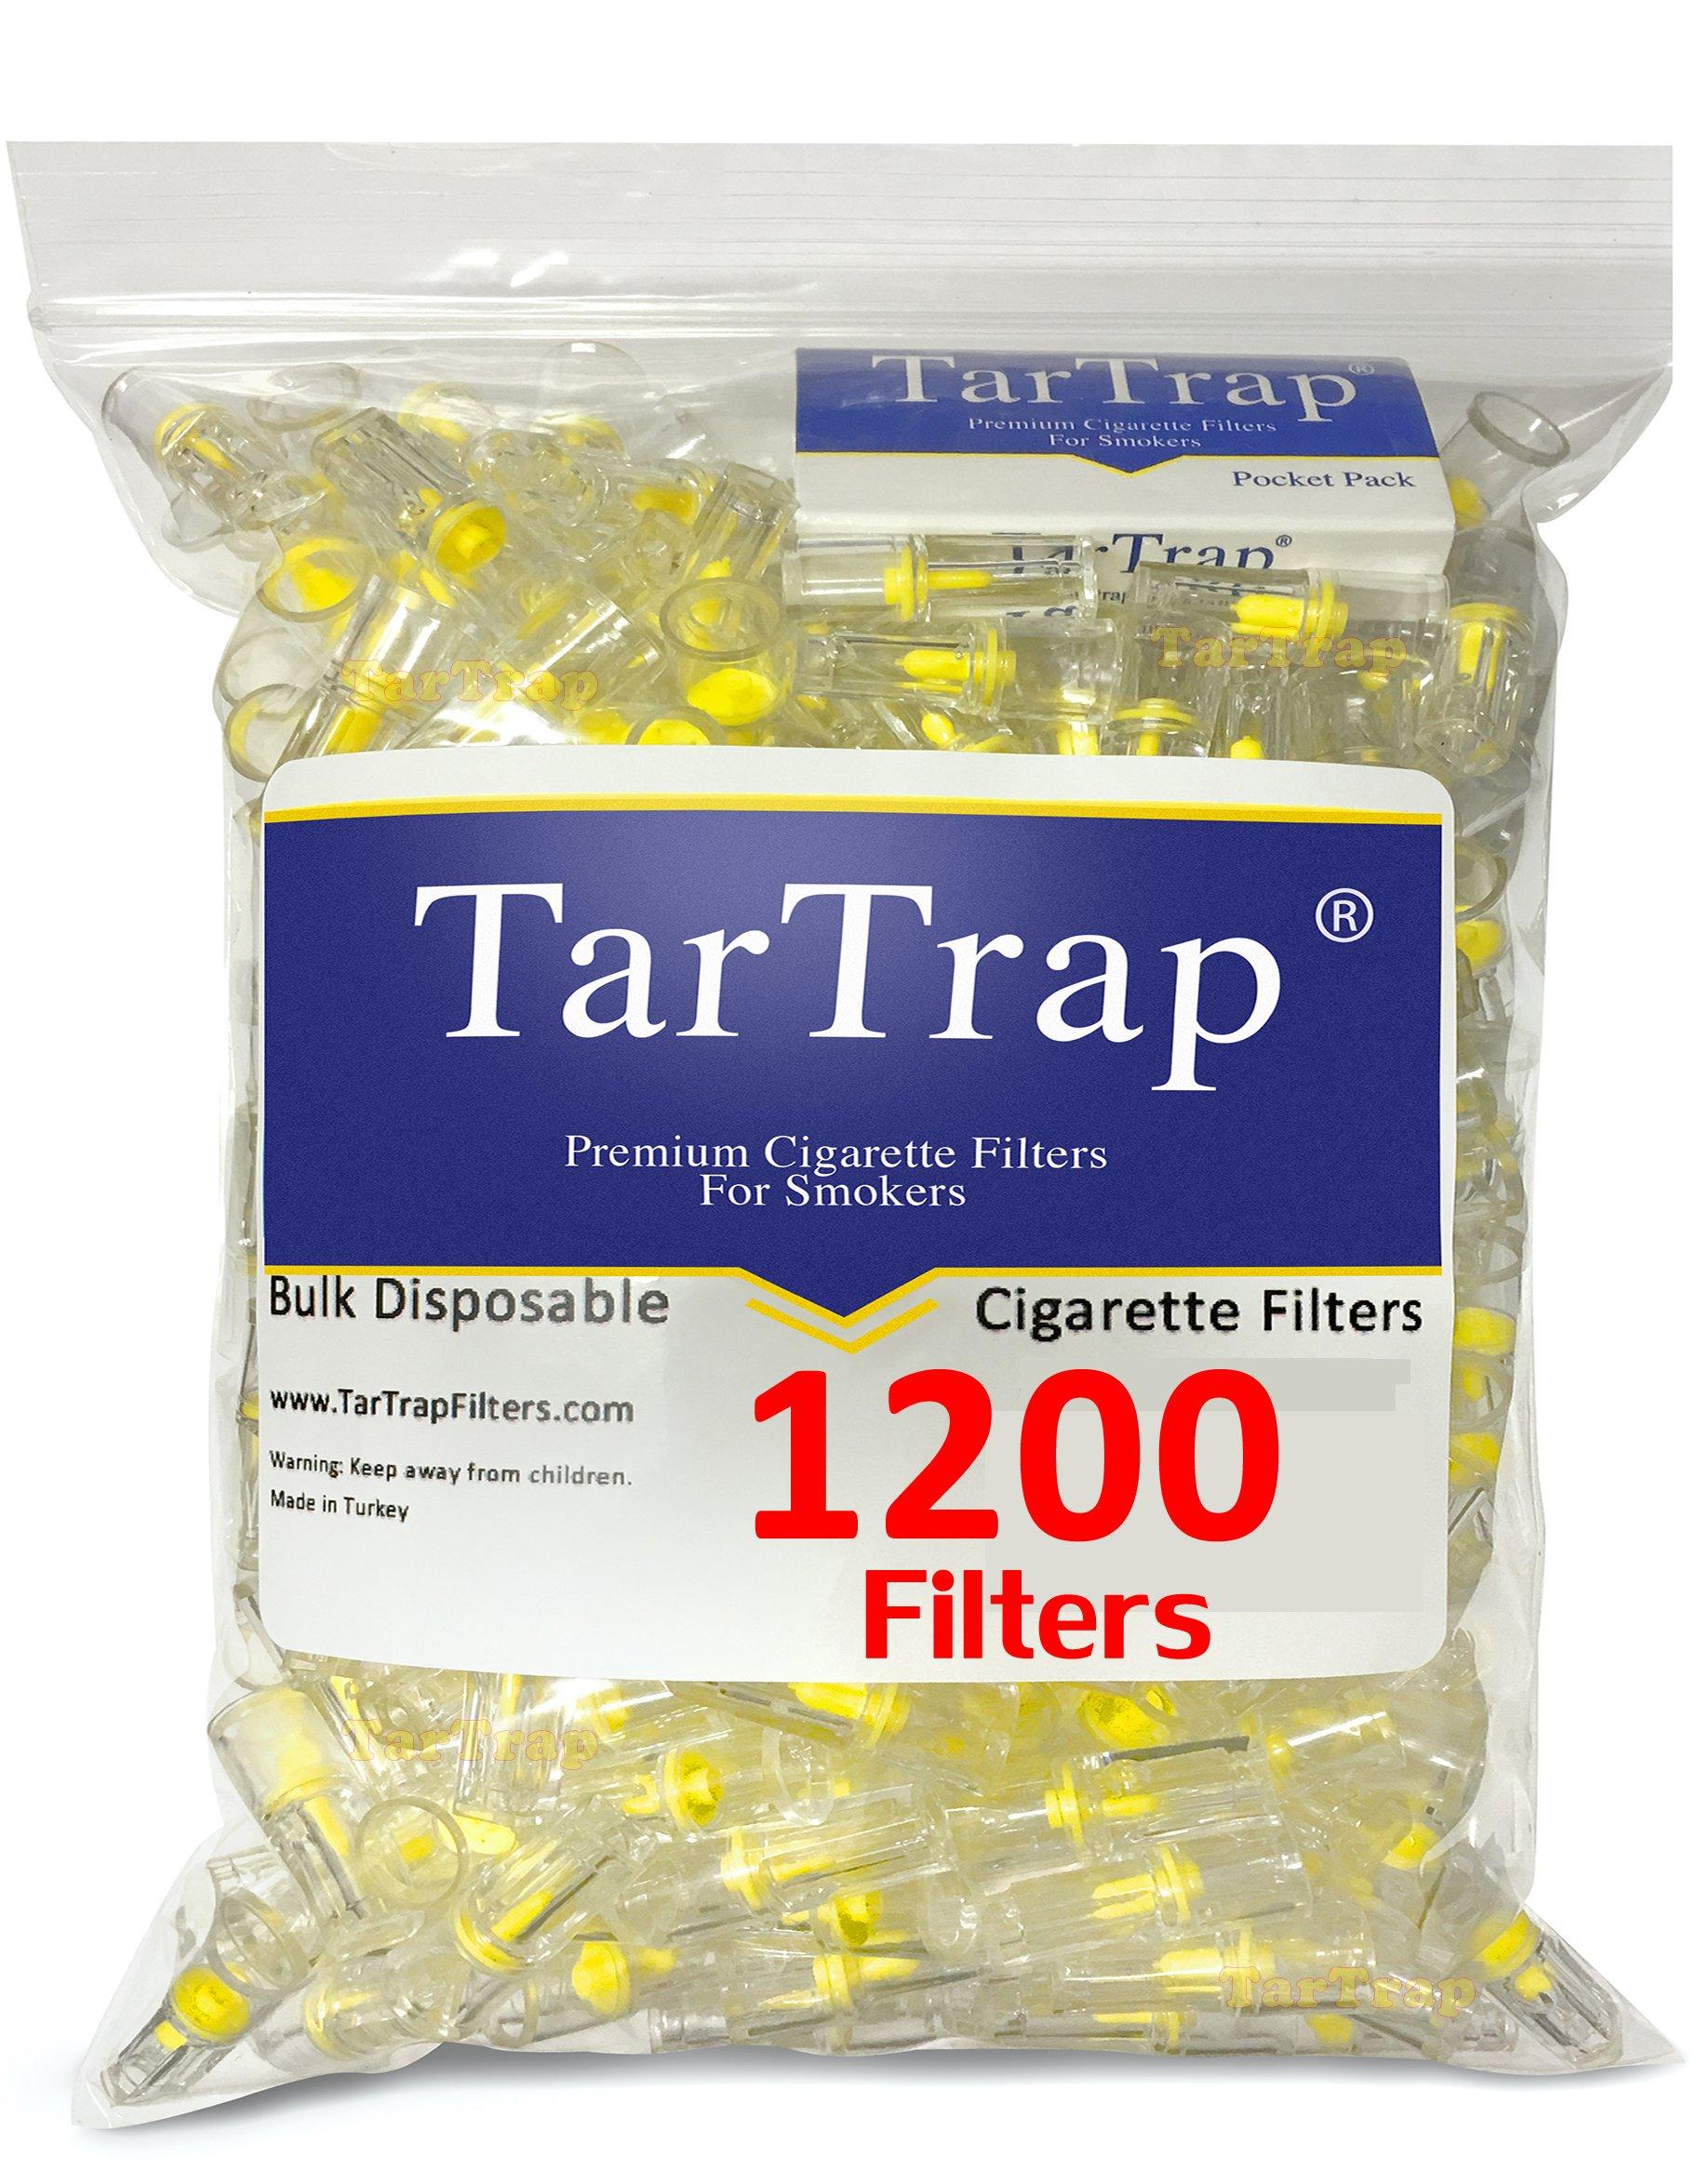 TarTrap Disposable Cigarette Filters - Bulk Economy Pack (1200 Filters Plus 4 FREE Lighters)